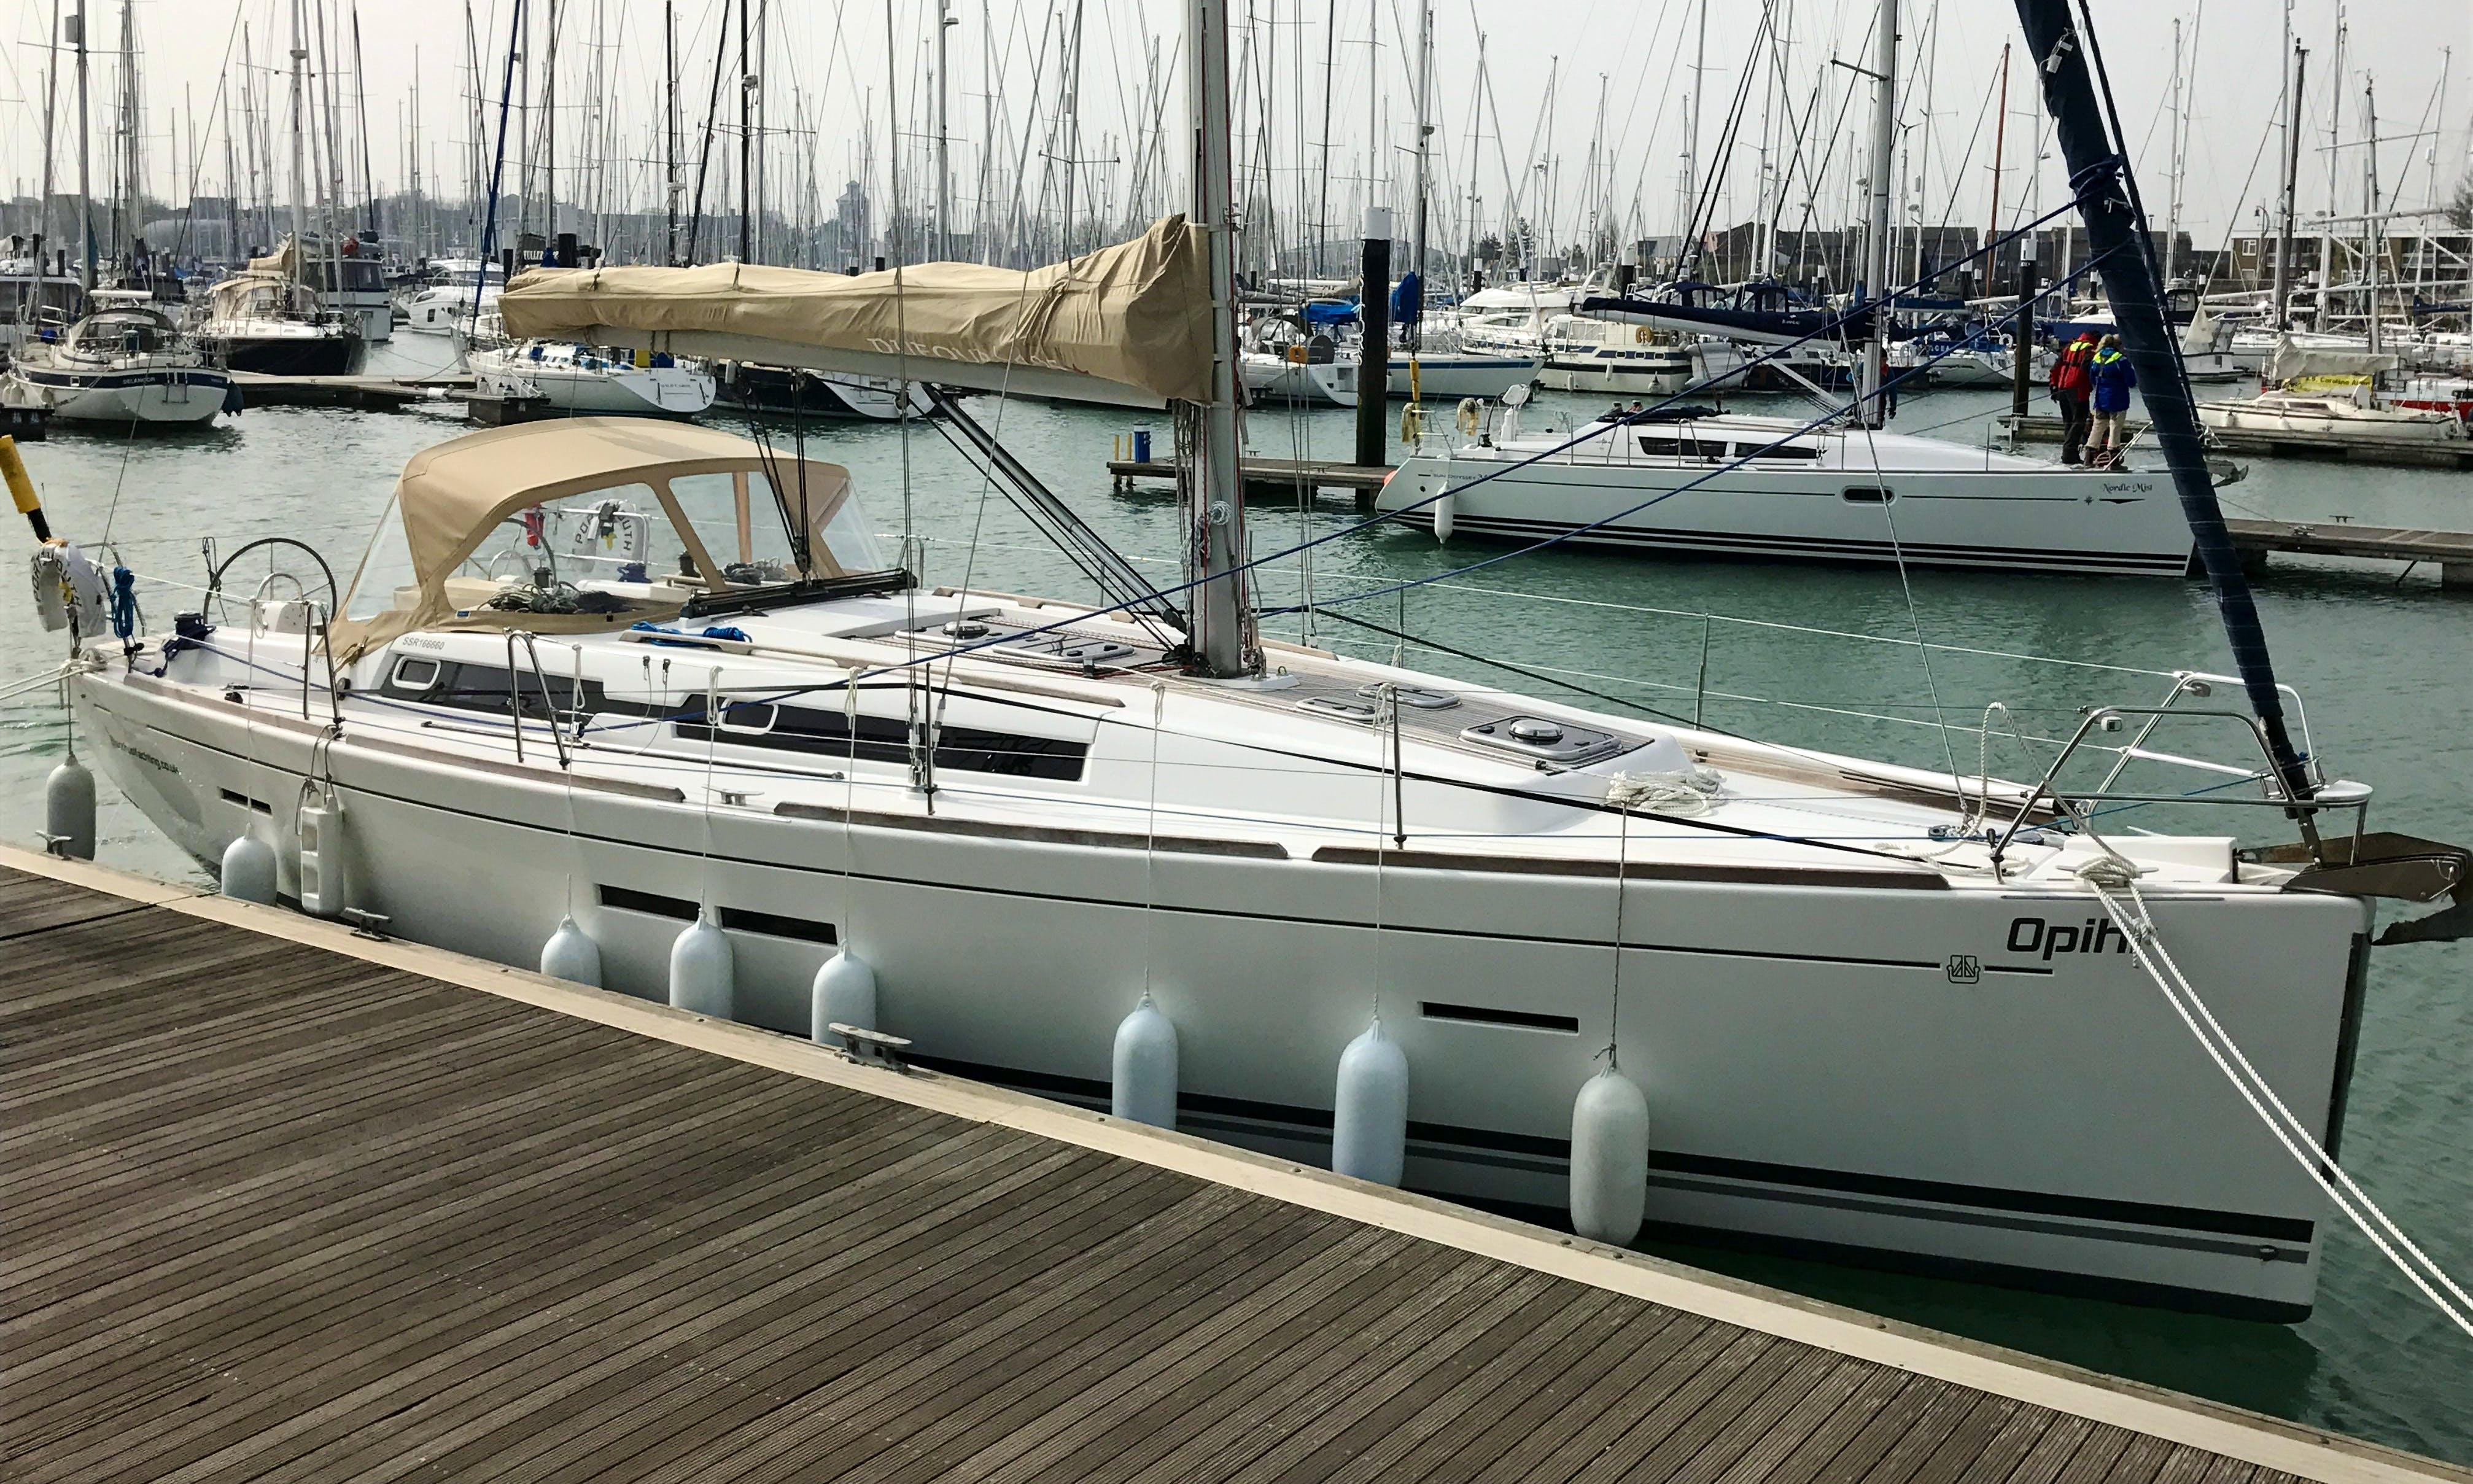 Charter 40' Opihr Cruising Monohull in Gosport, England